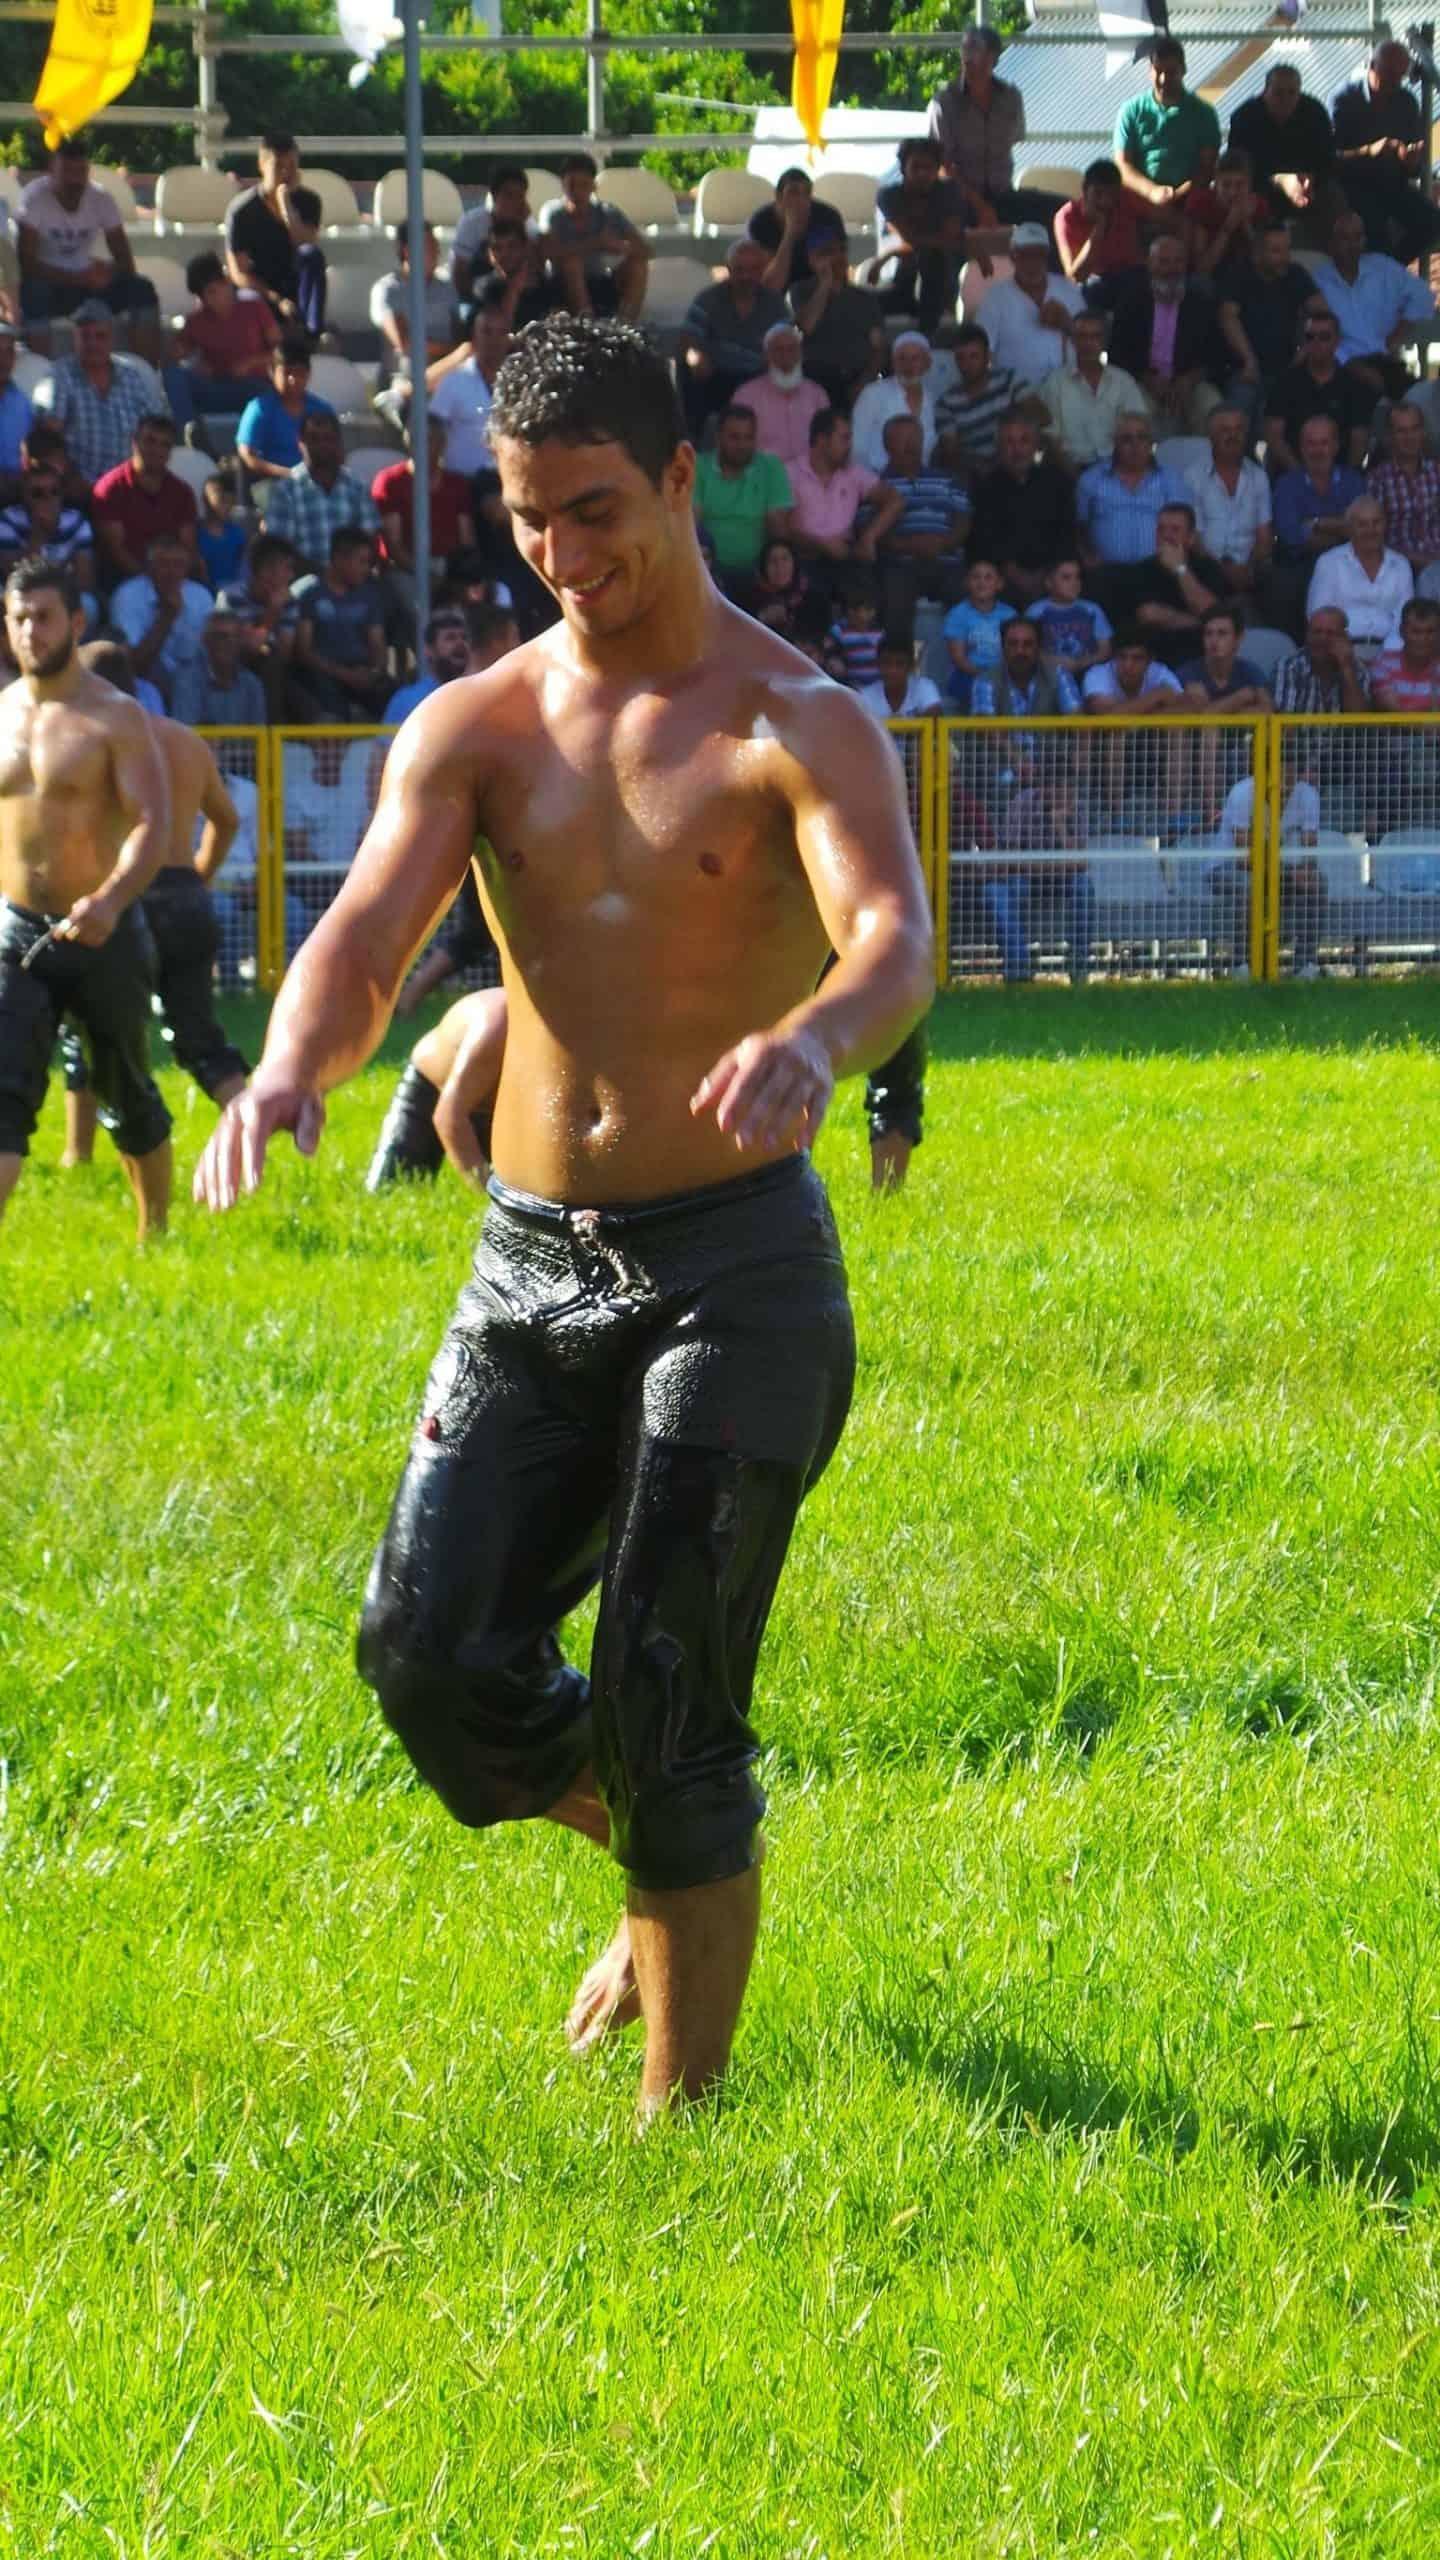 turkish oil wrestlers entering the field